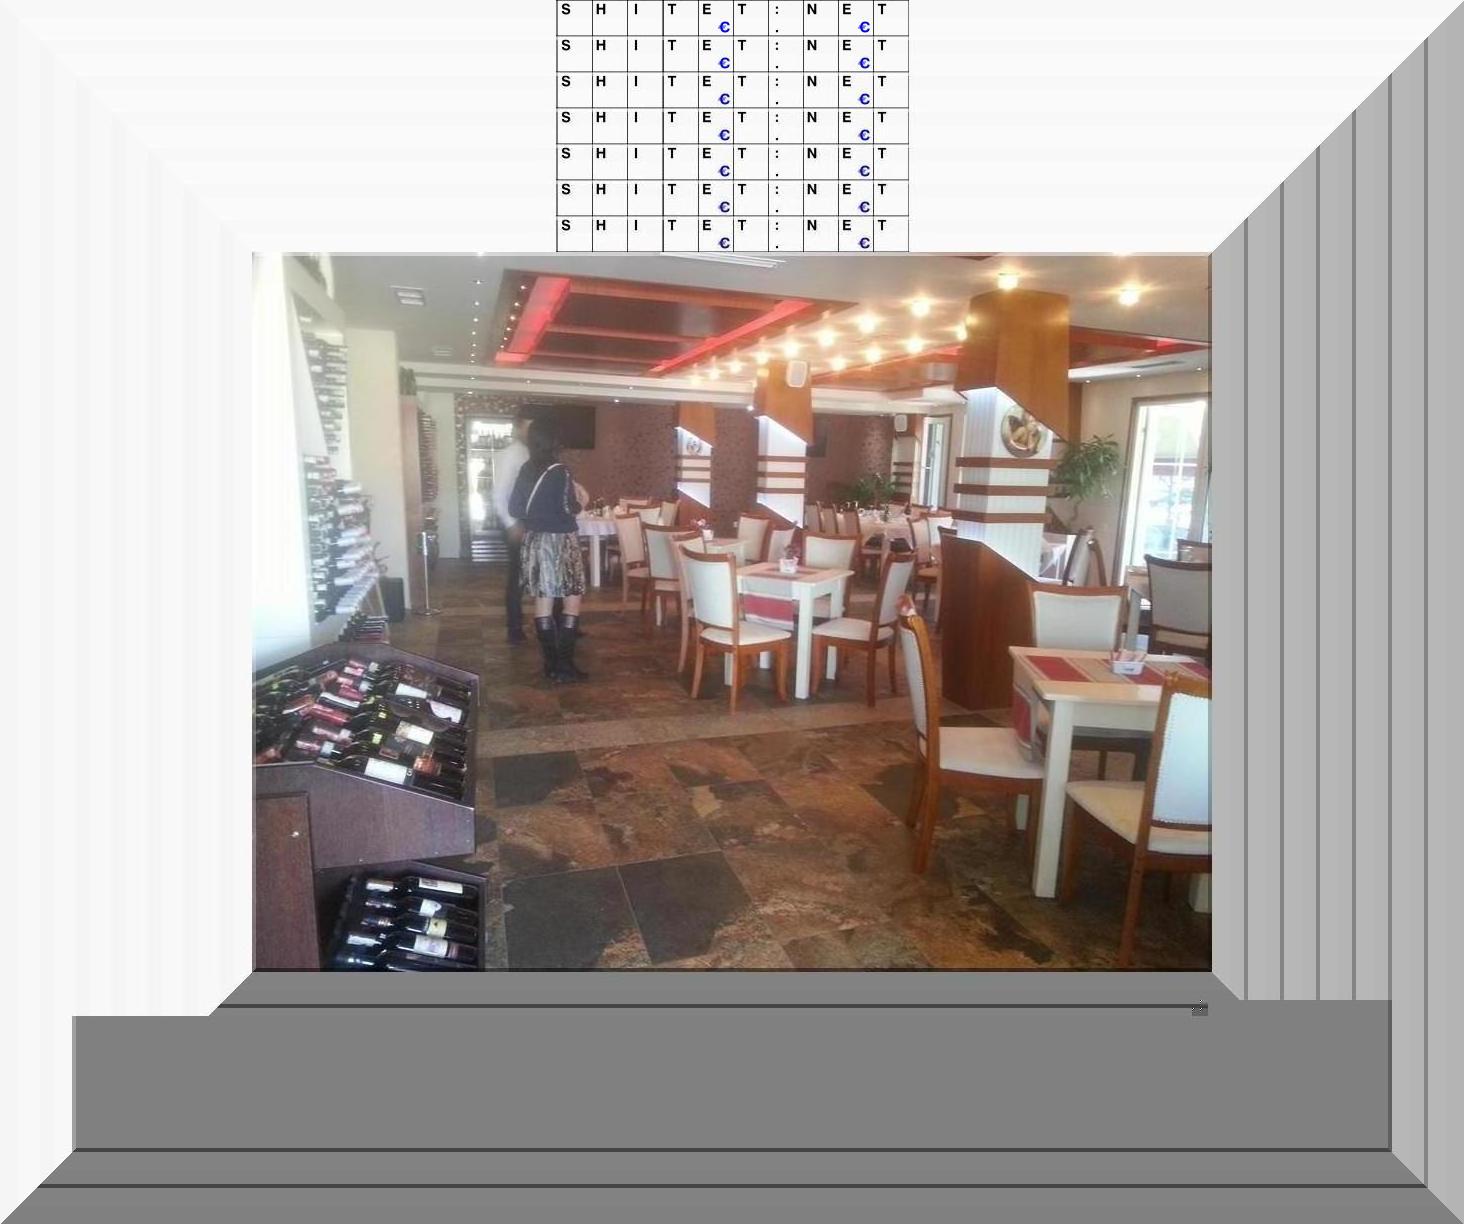 Restorant,Piceri